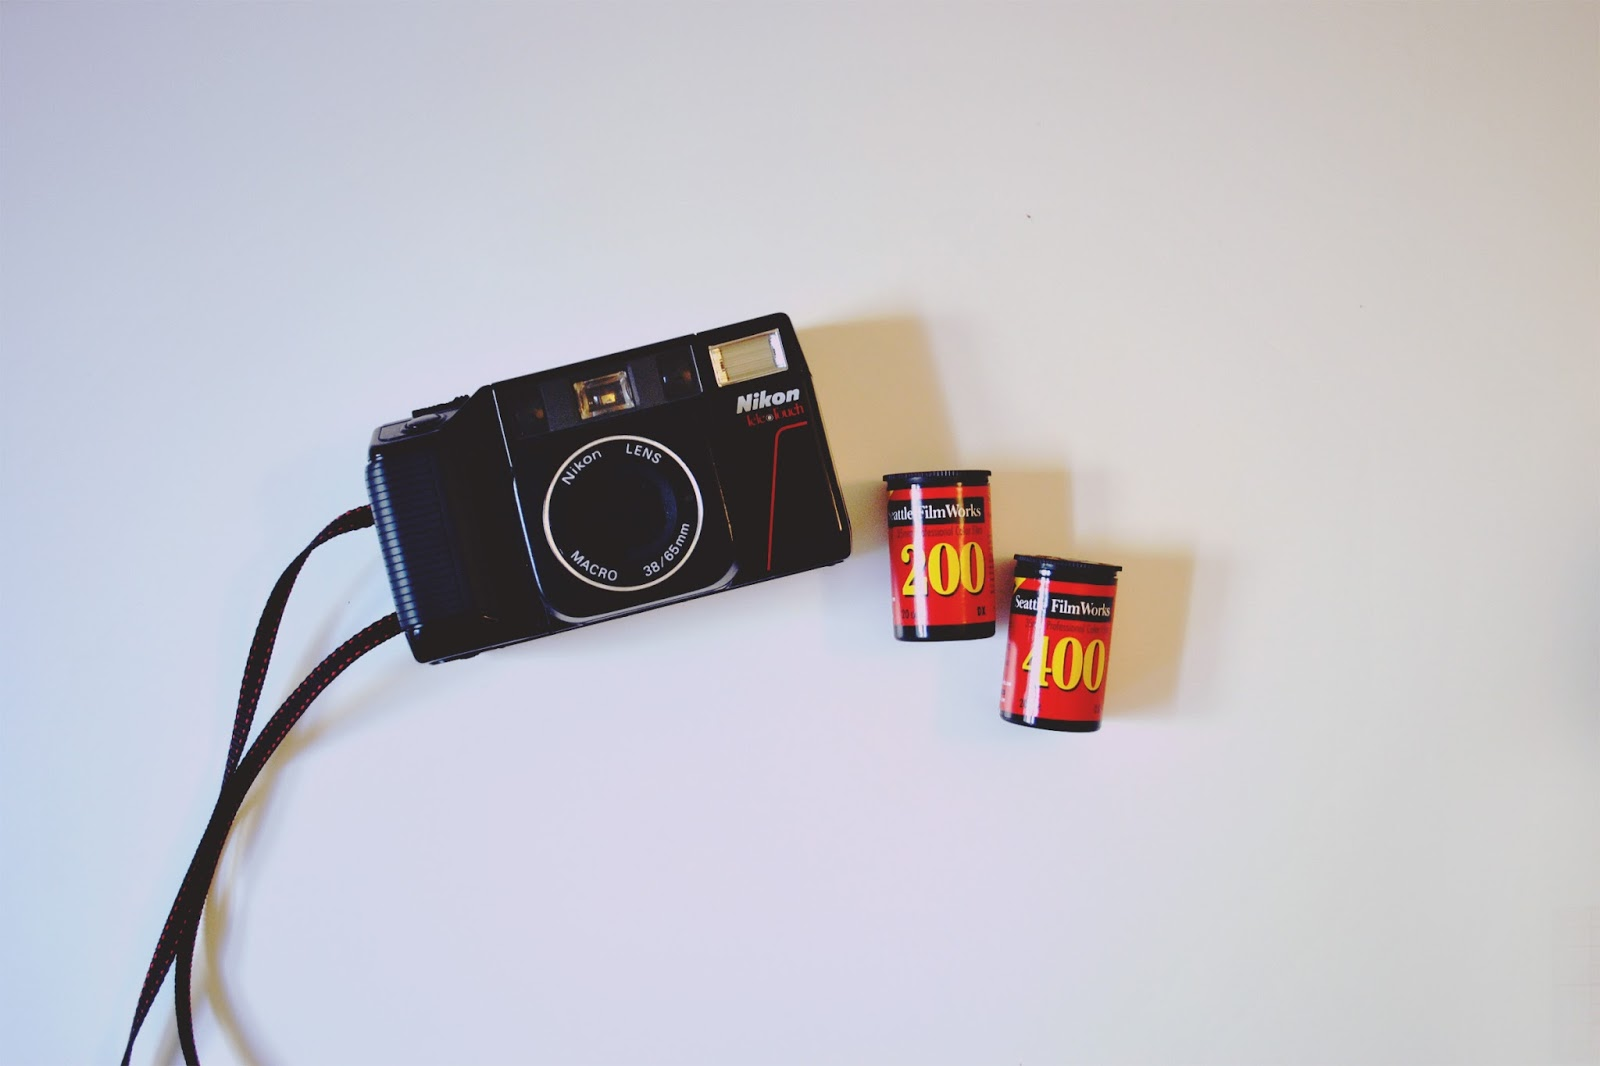 Nikon Camera & 35mm Film